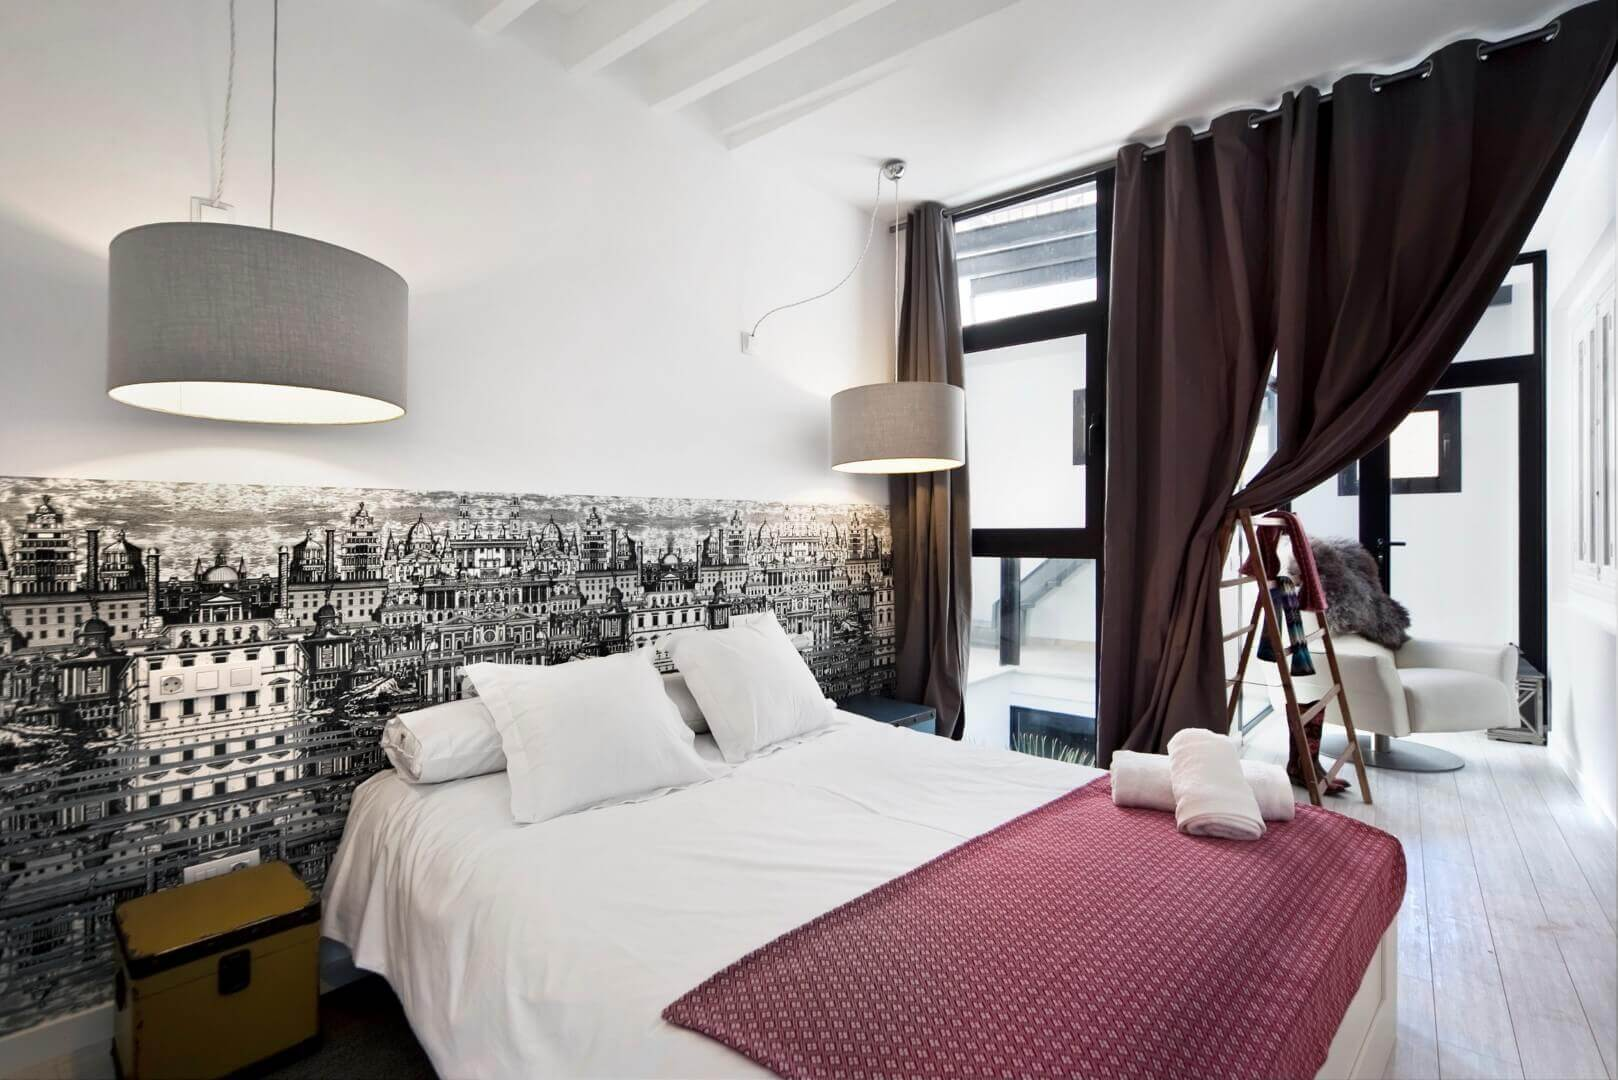 Hoteles de lujo con dise o nico en espa a 10decoracion for Hotel diseno alicante